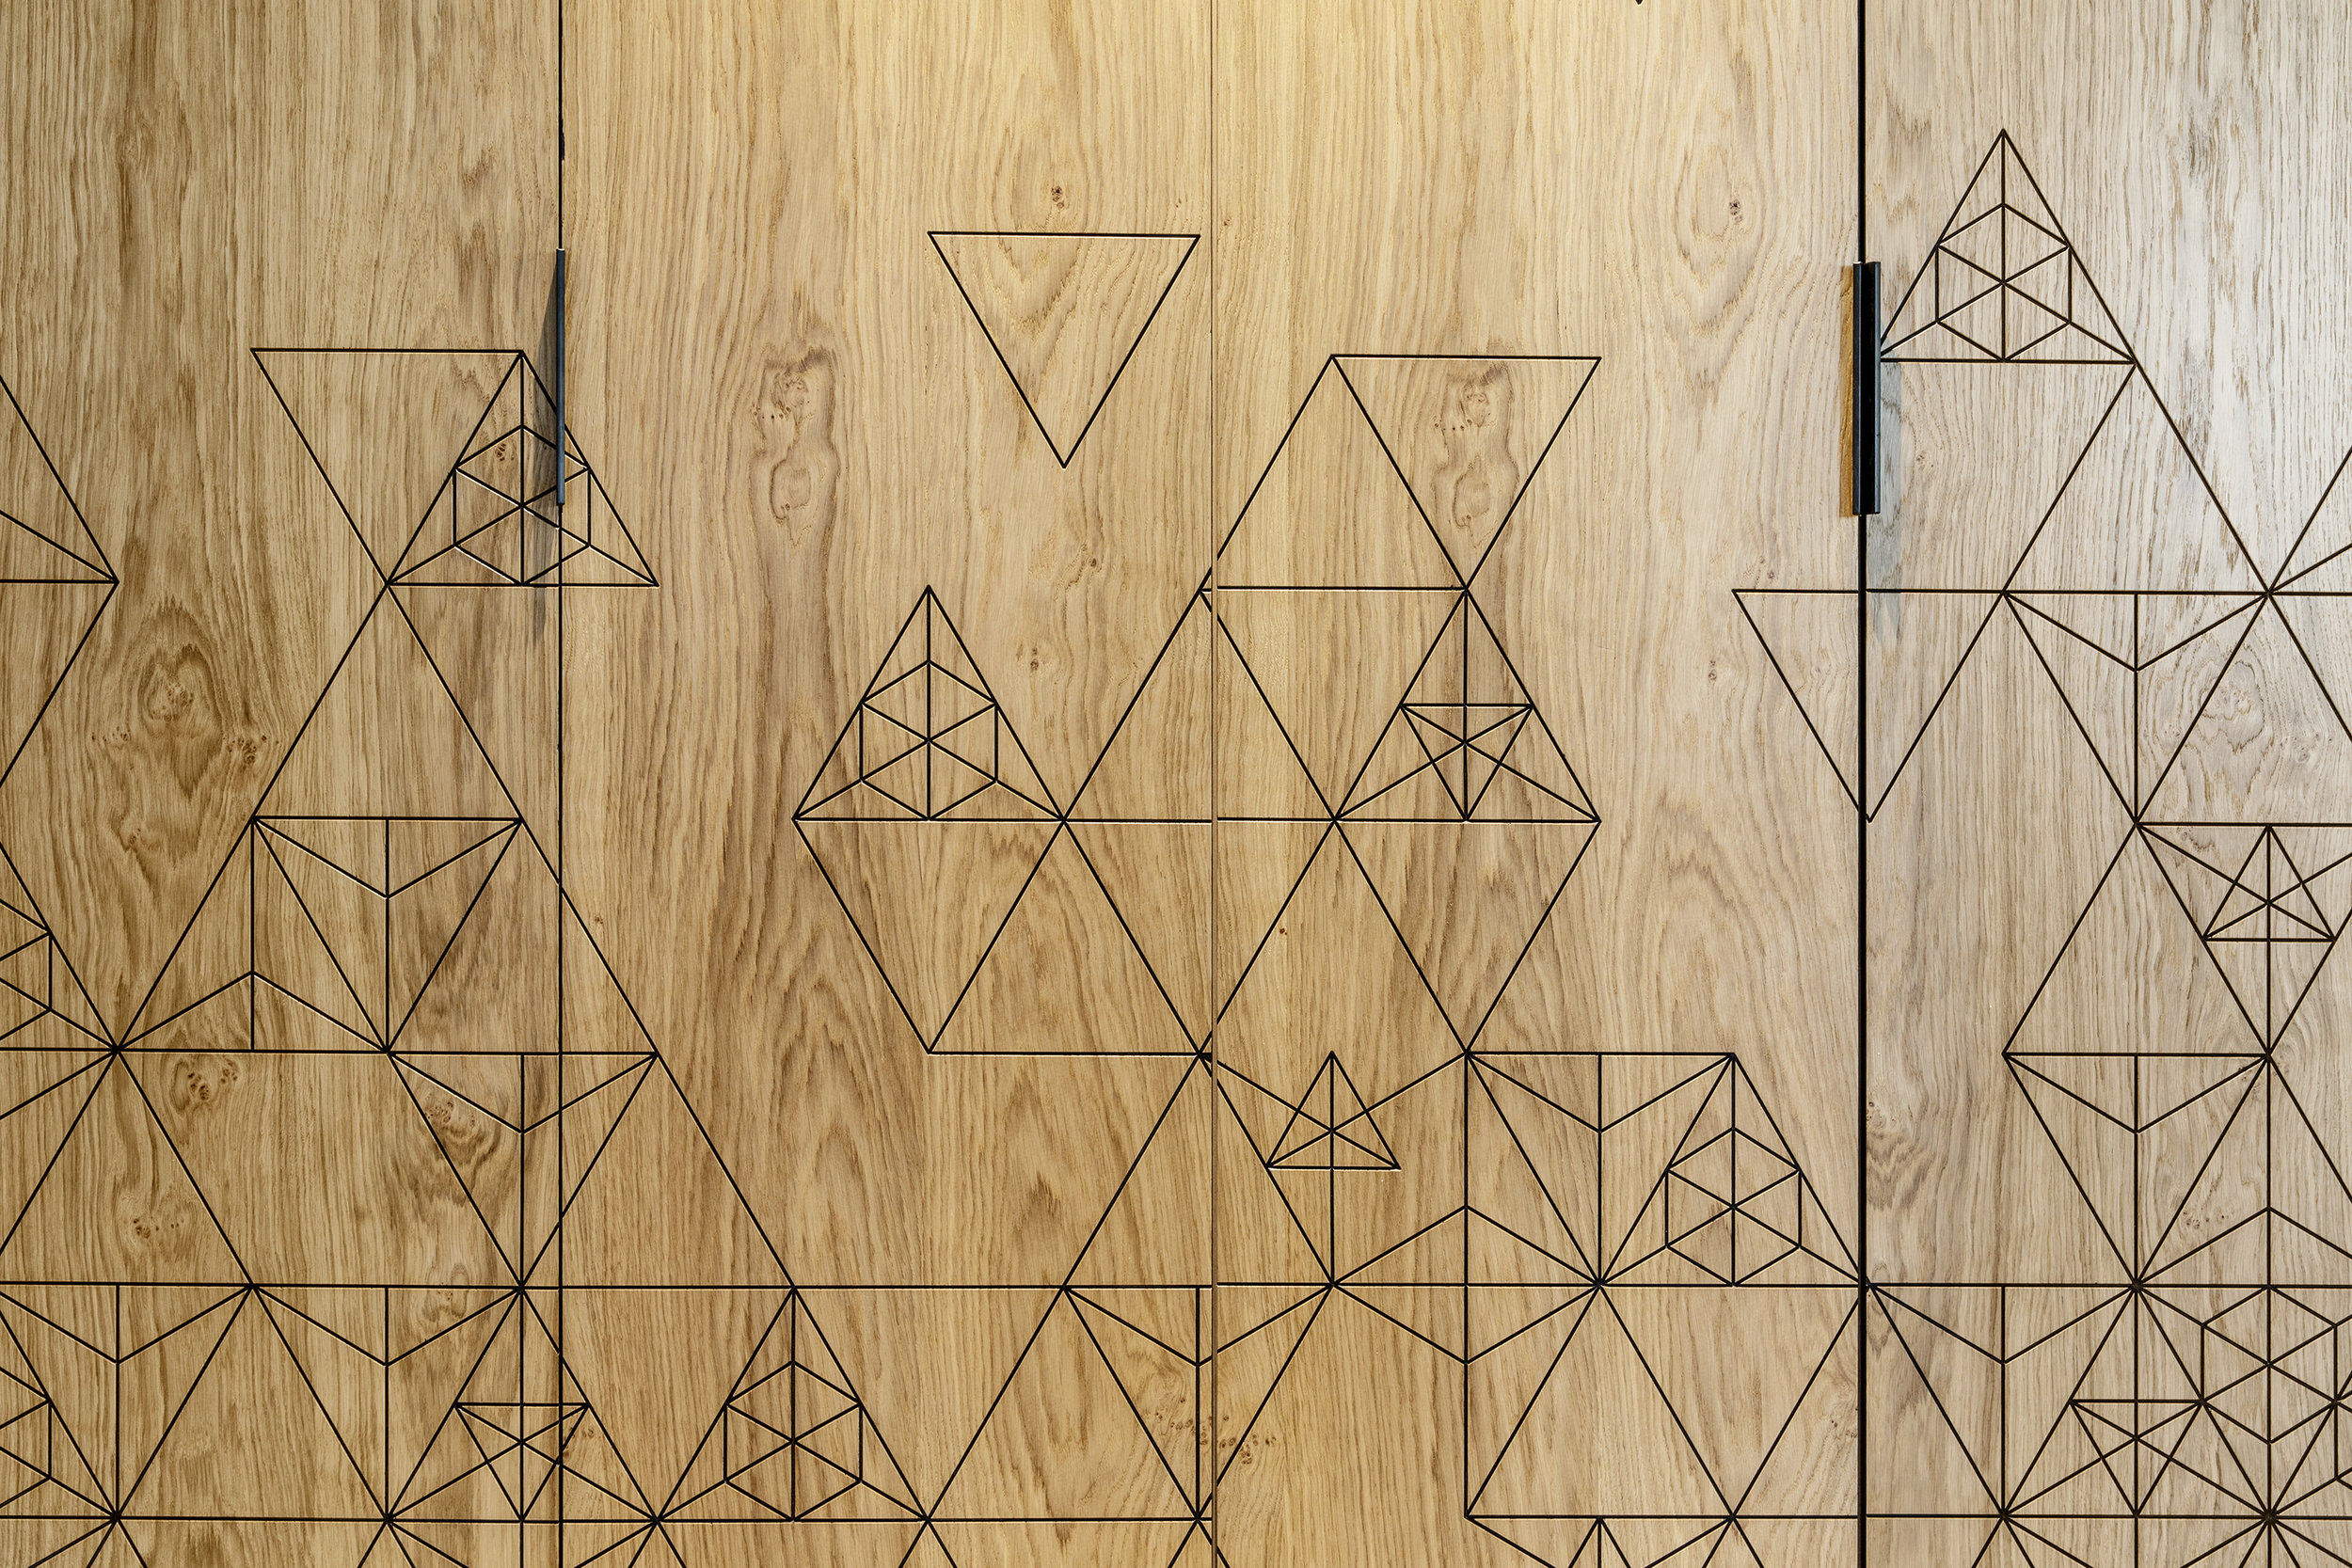 PLAYTIKA ROGOBIN - ROY DAVID ARCHITECTURE STUDIO - פלייטיקה רואי דוד אדריכלות אדריכלים סטודיו (15).jpg